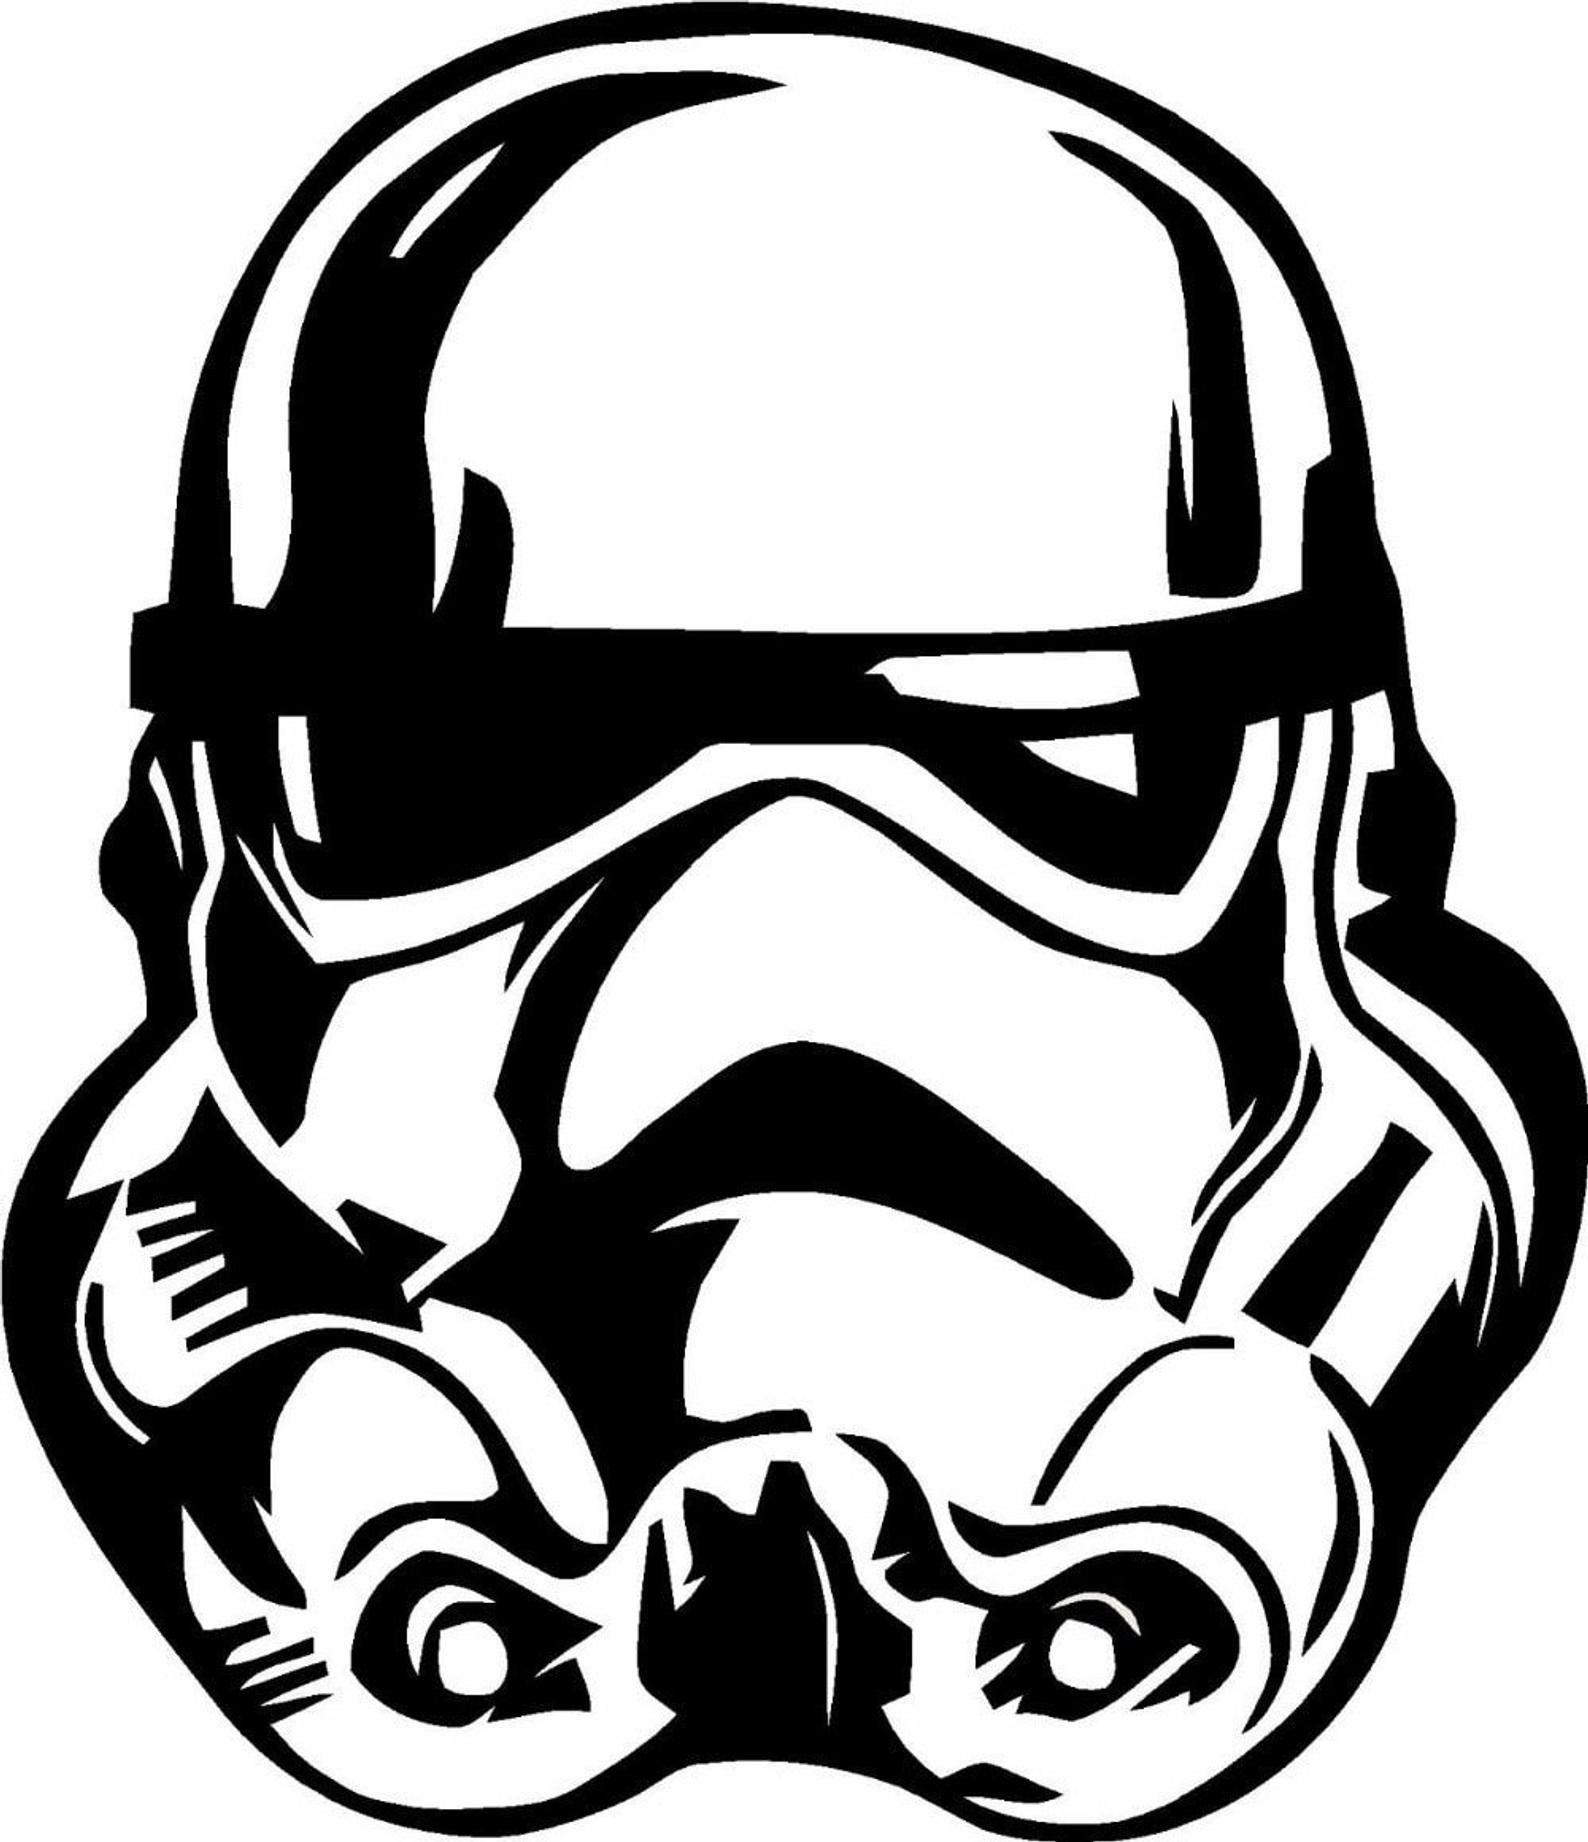 Star Wars Storm Trooper Decal Etsy Star Wars Silhouette Star Wars Decal Star Wars Stencil [ jpg ]